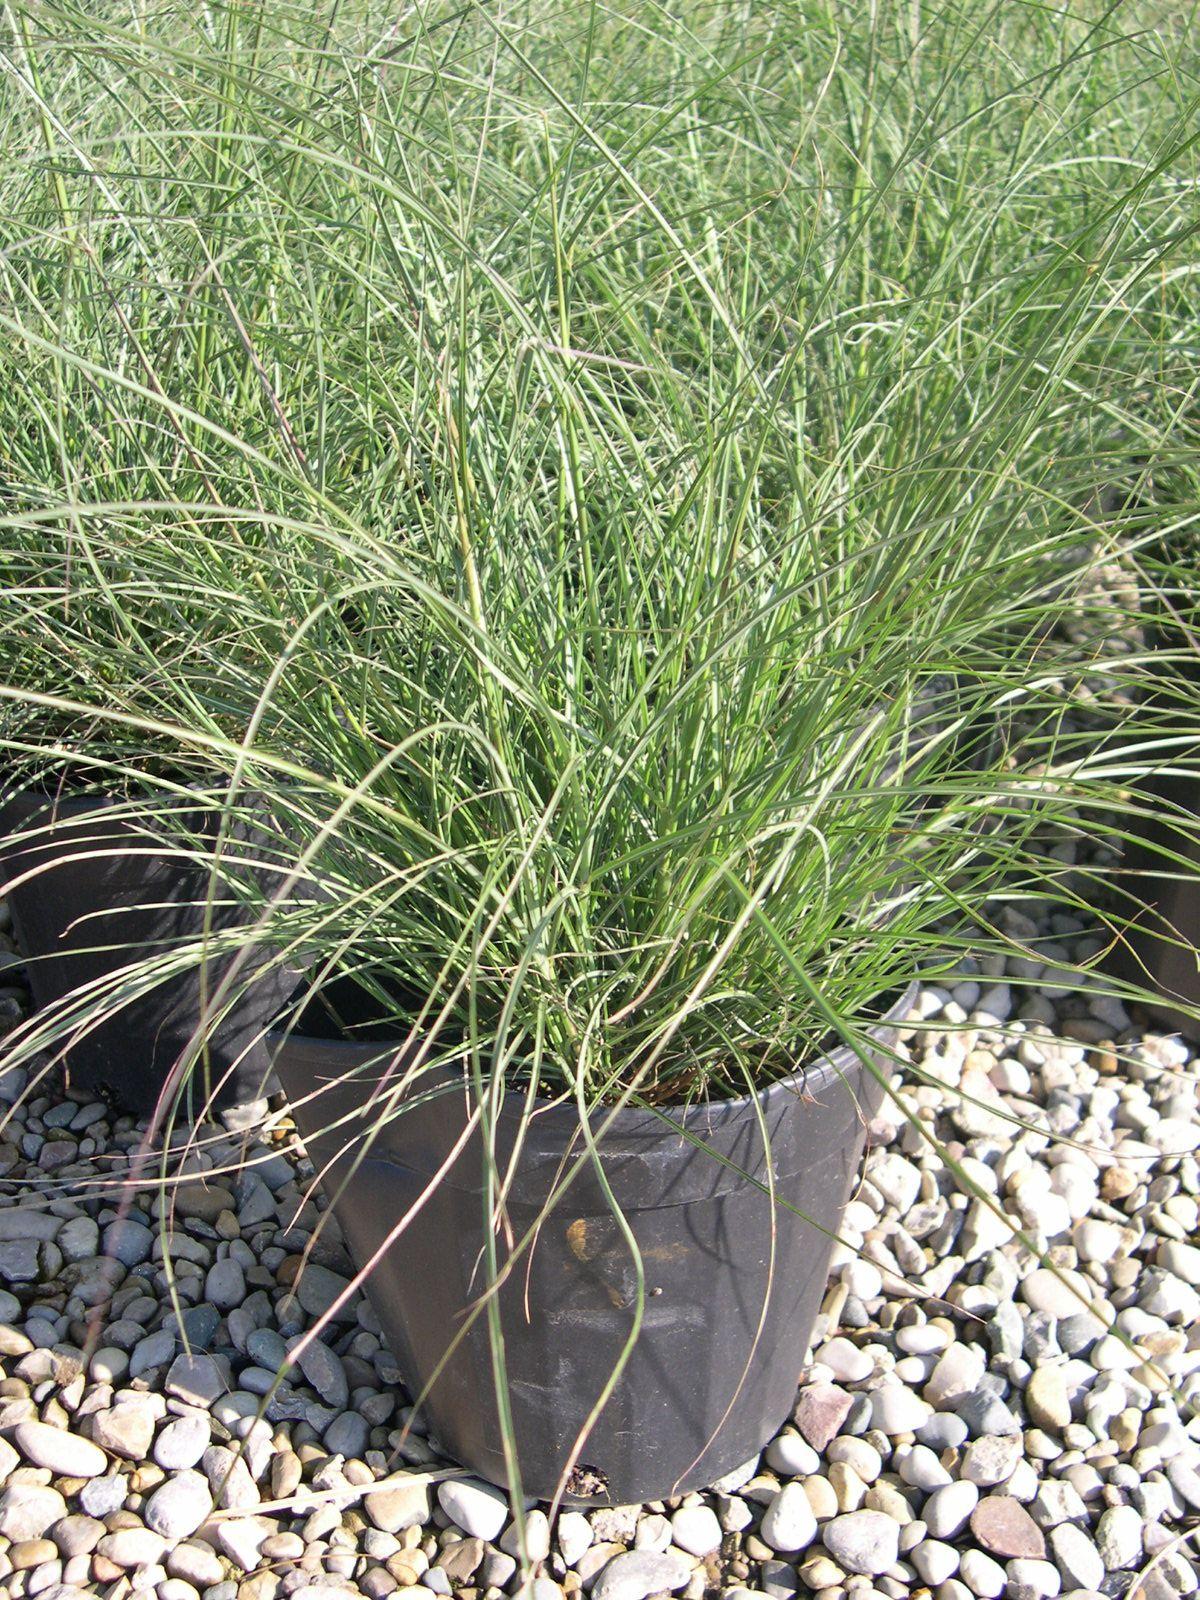 Miscanthus Sinensis Little Kitten Little Kitten Maiden Grass Grasses Garden Ornamental Grasses Grass